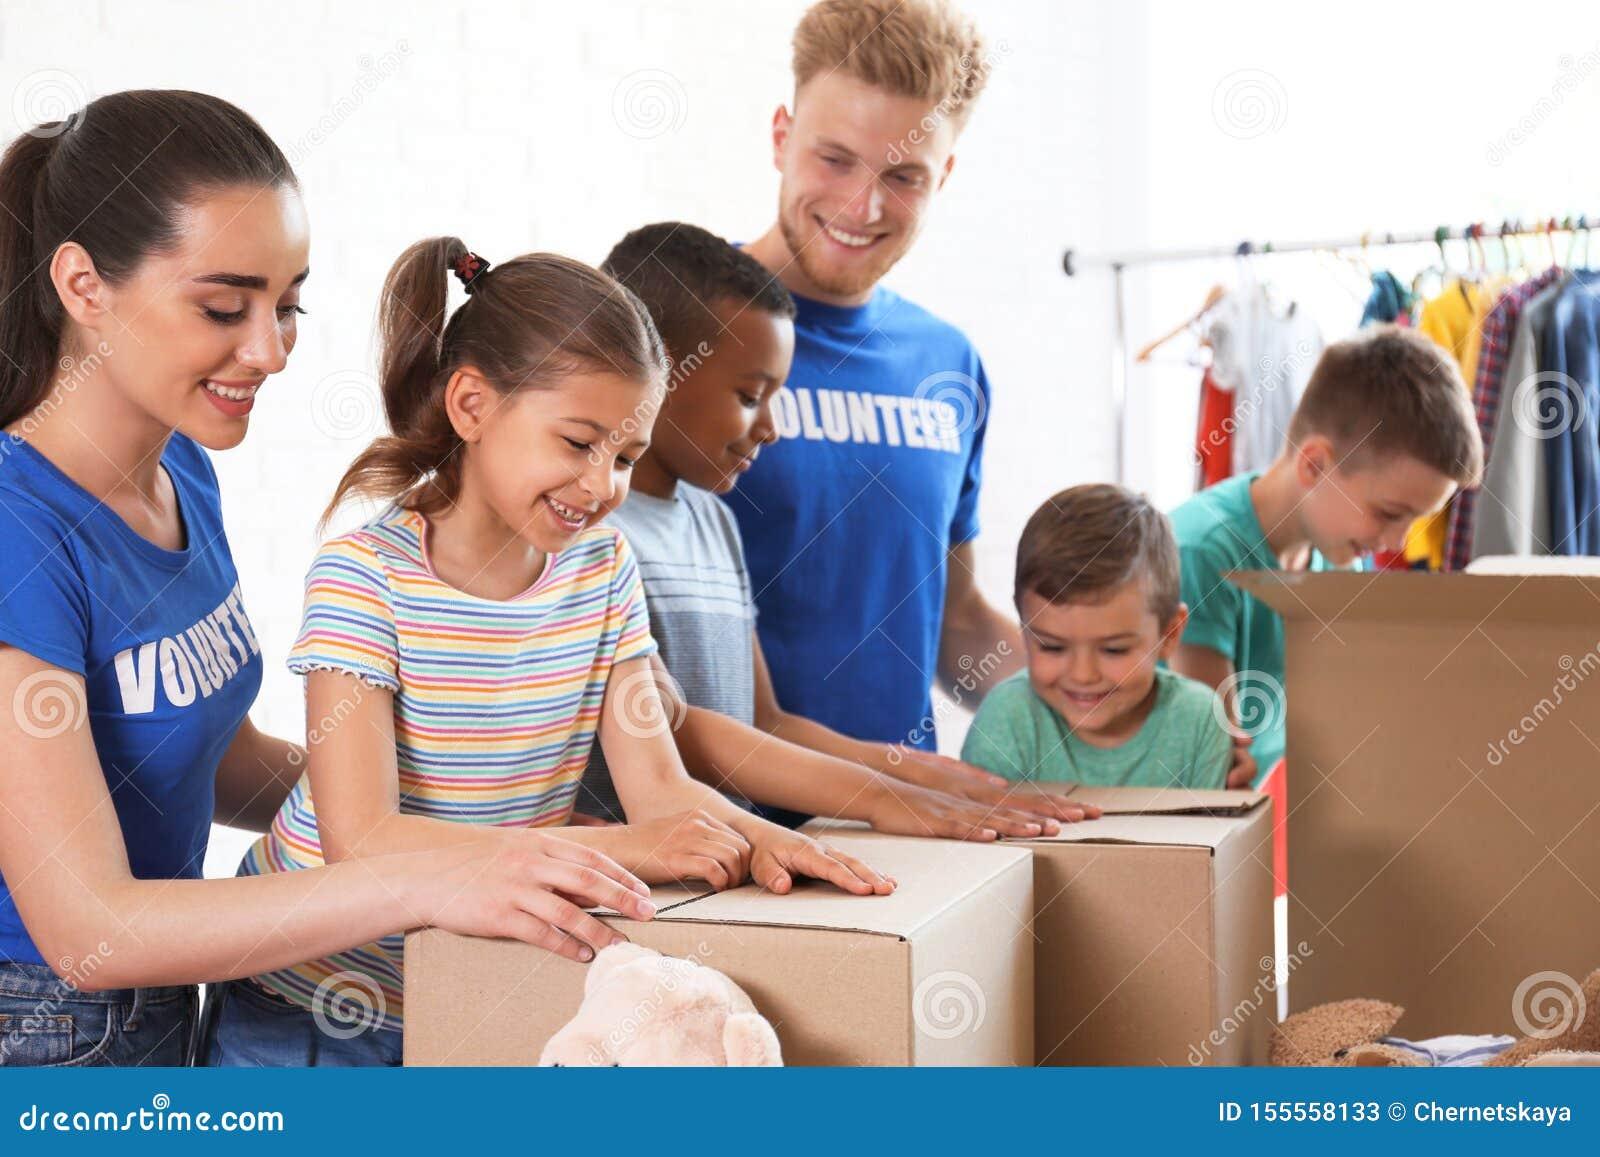 Freiwillige mit Kinderspendenwaren zuhause